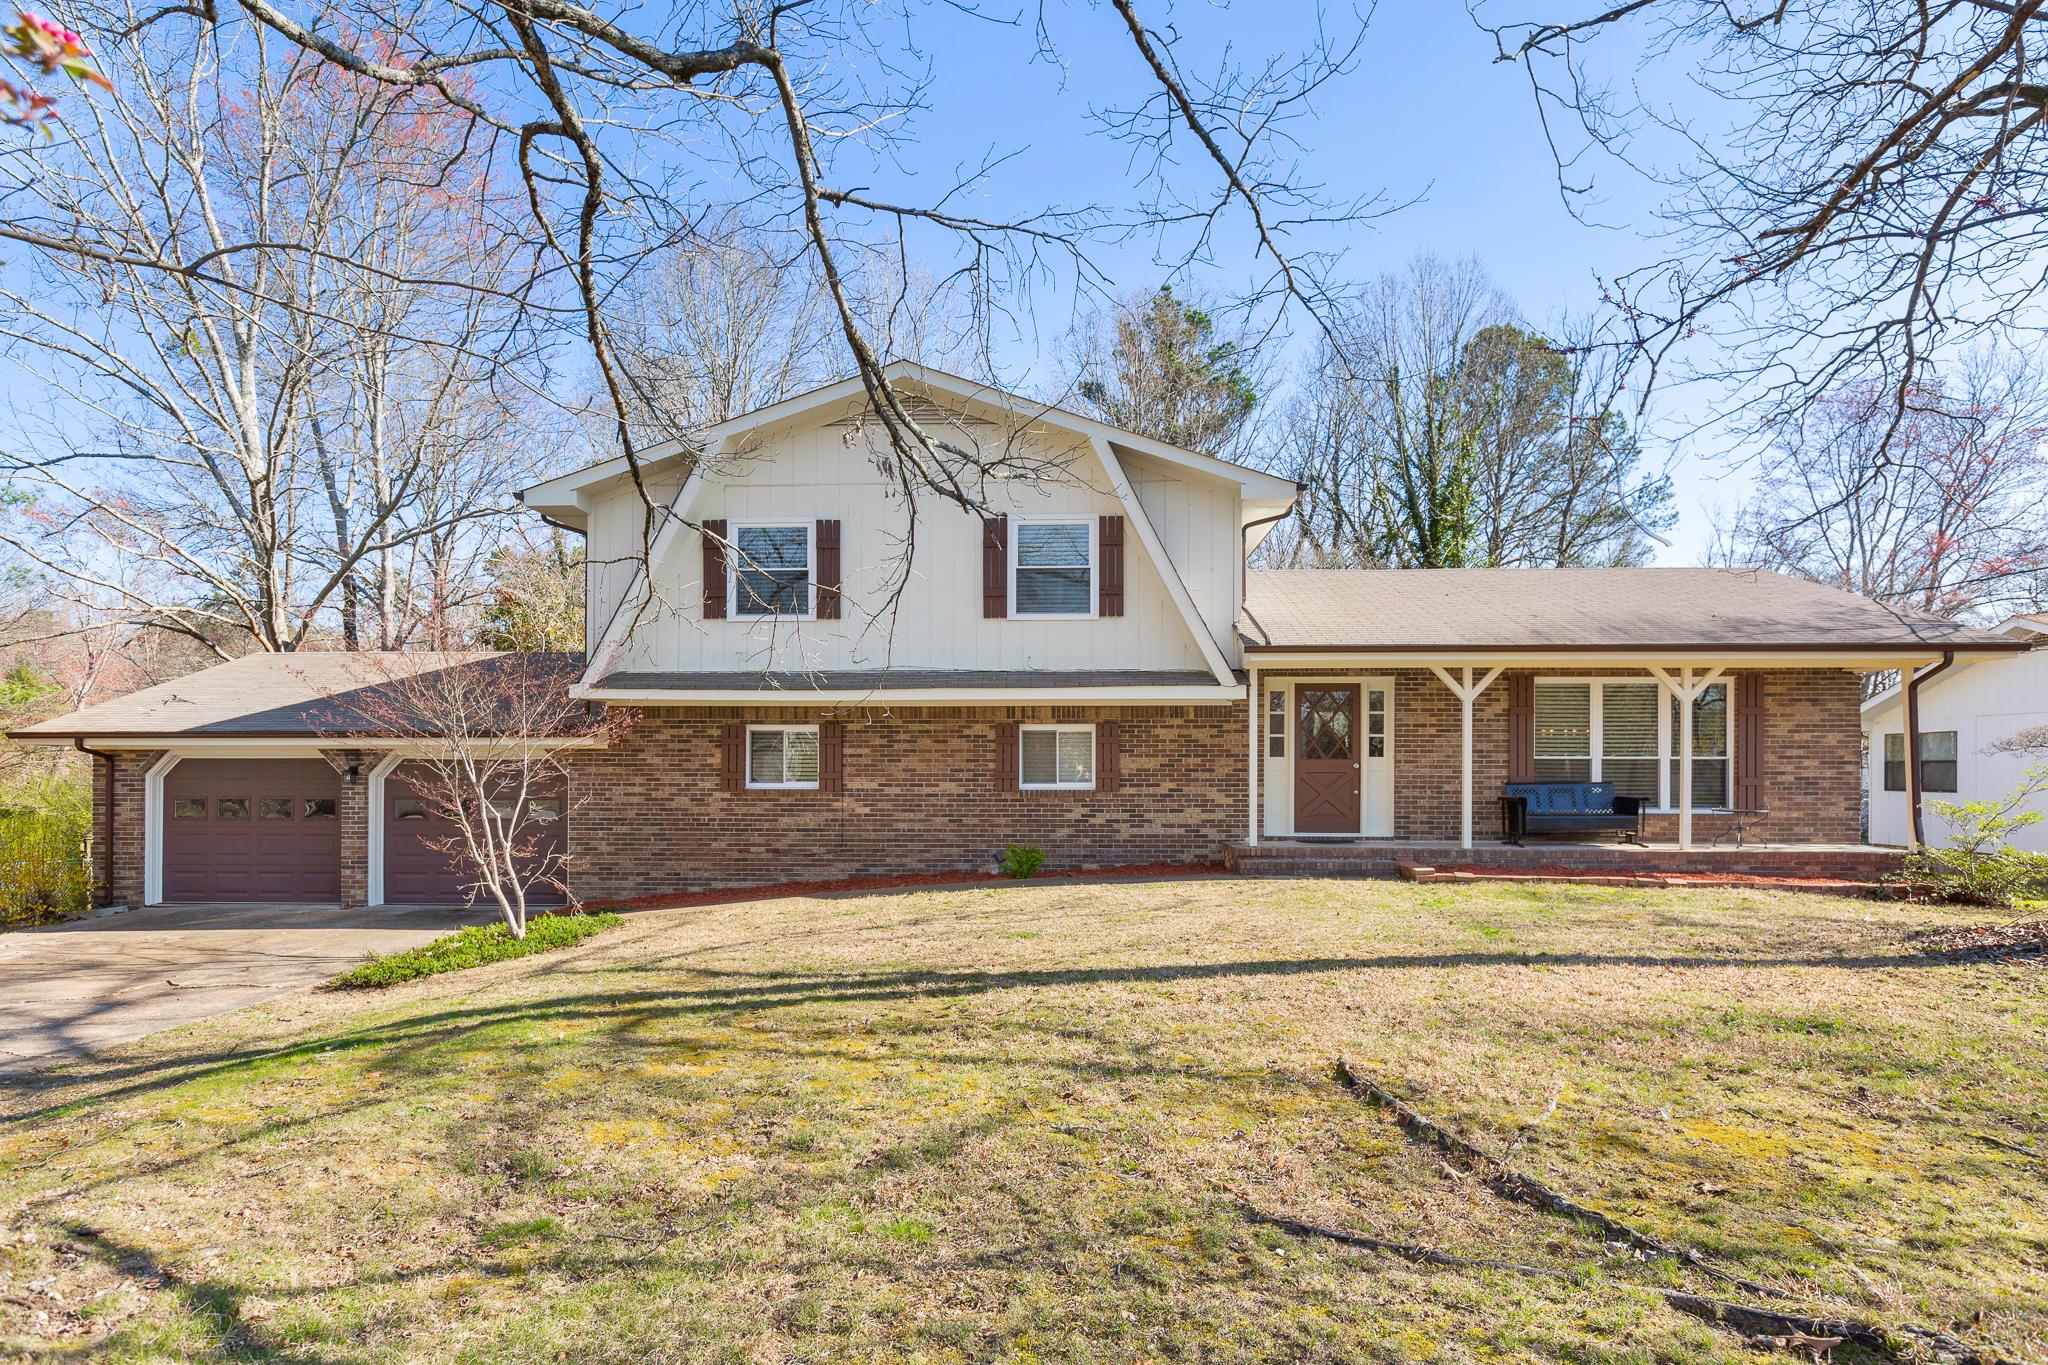 2407 Cedar Creek Dr, Chattanooga, TN 37421